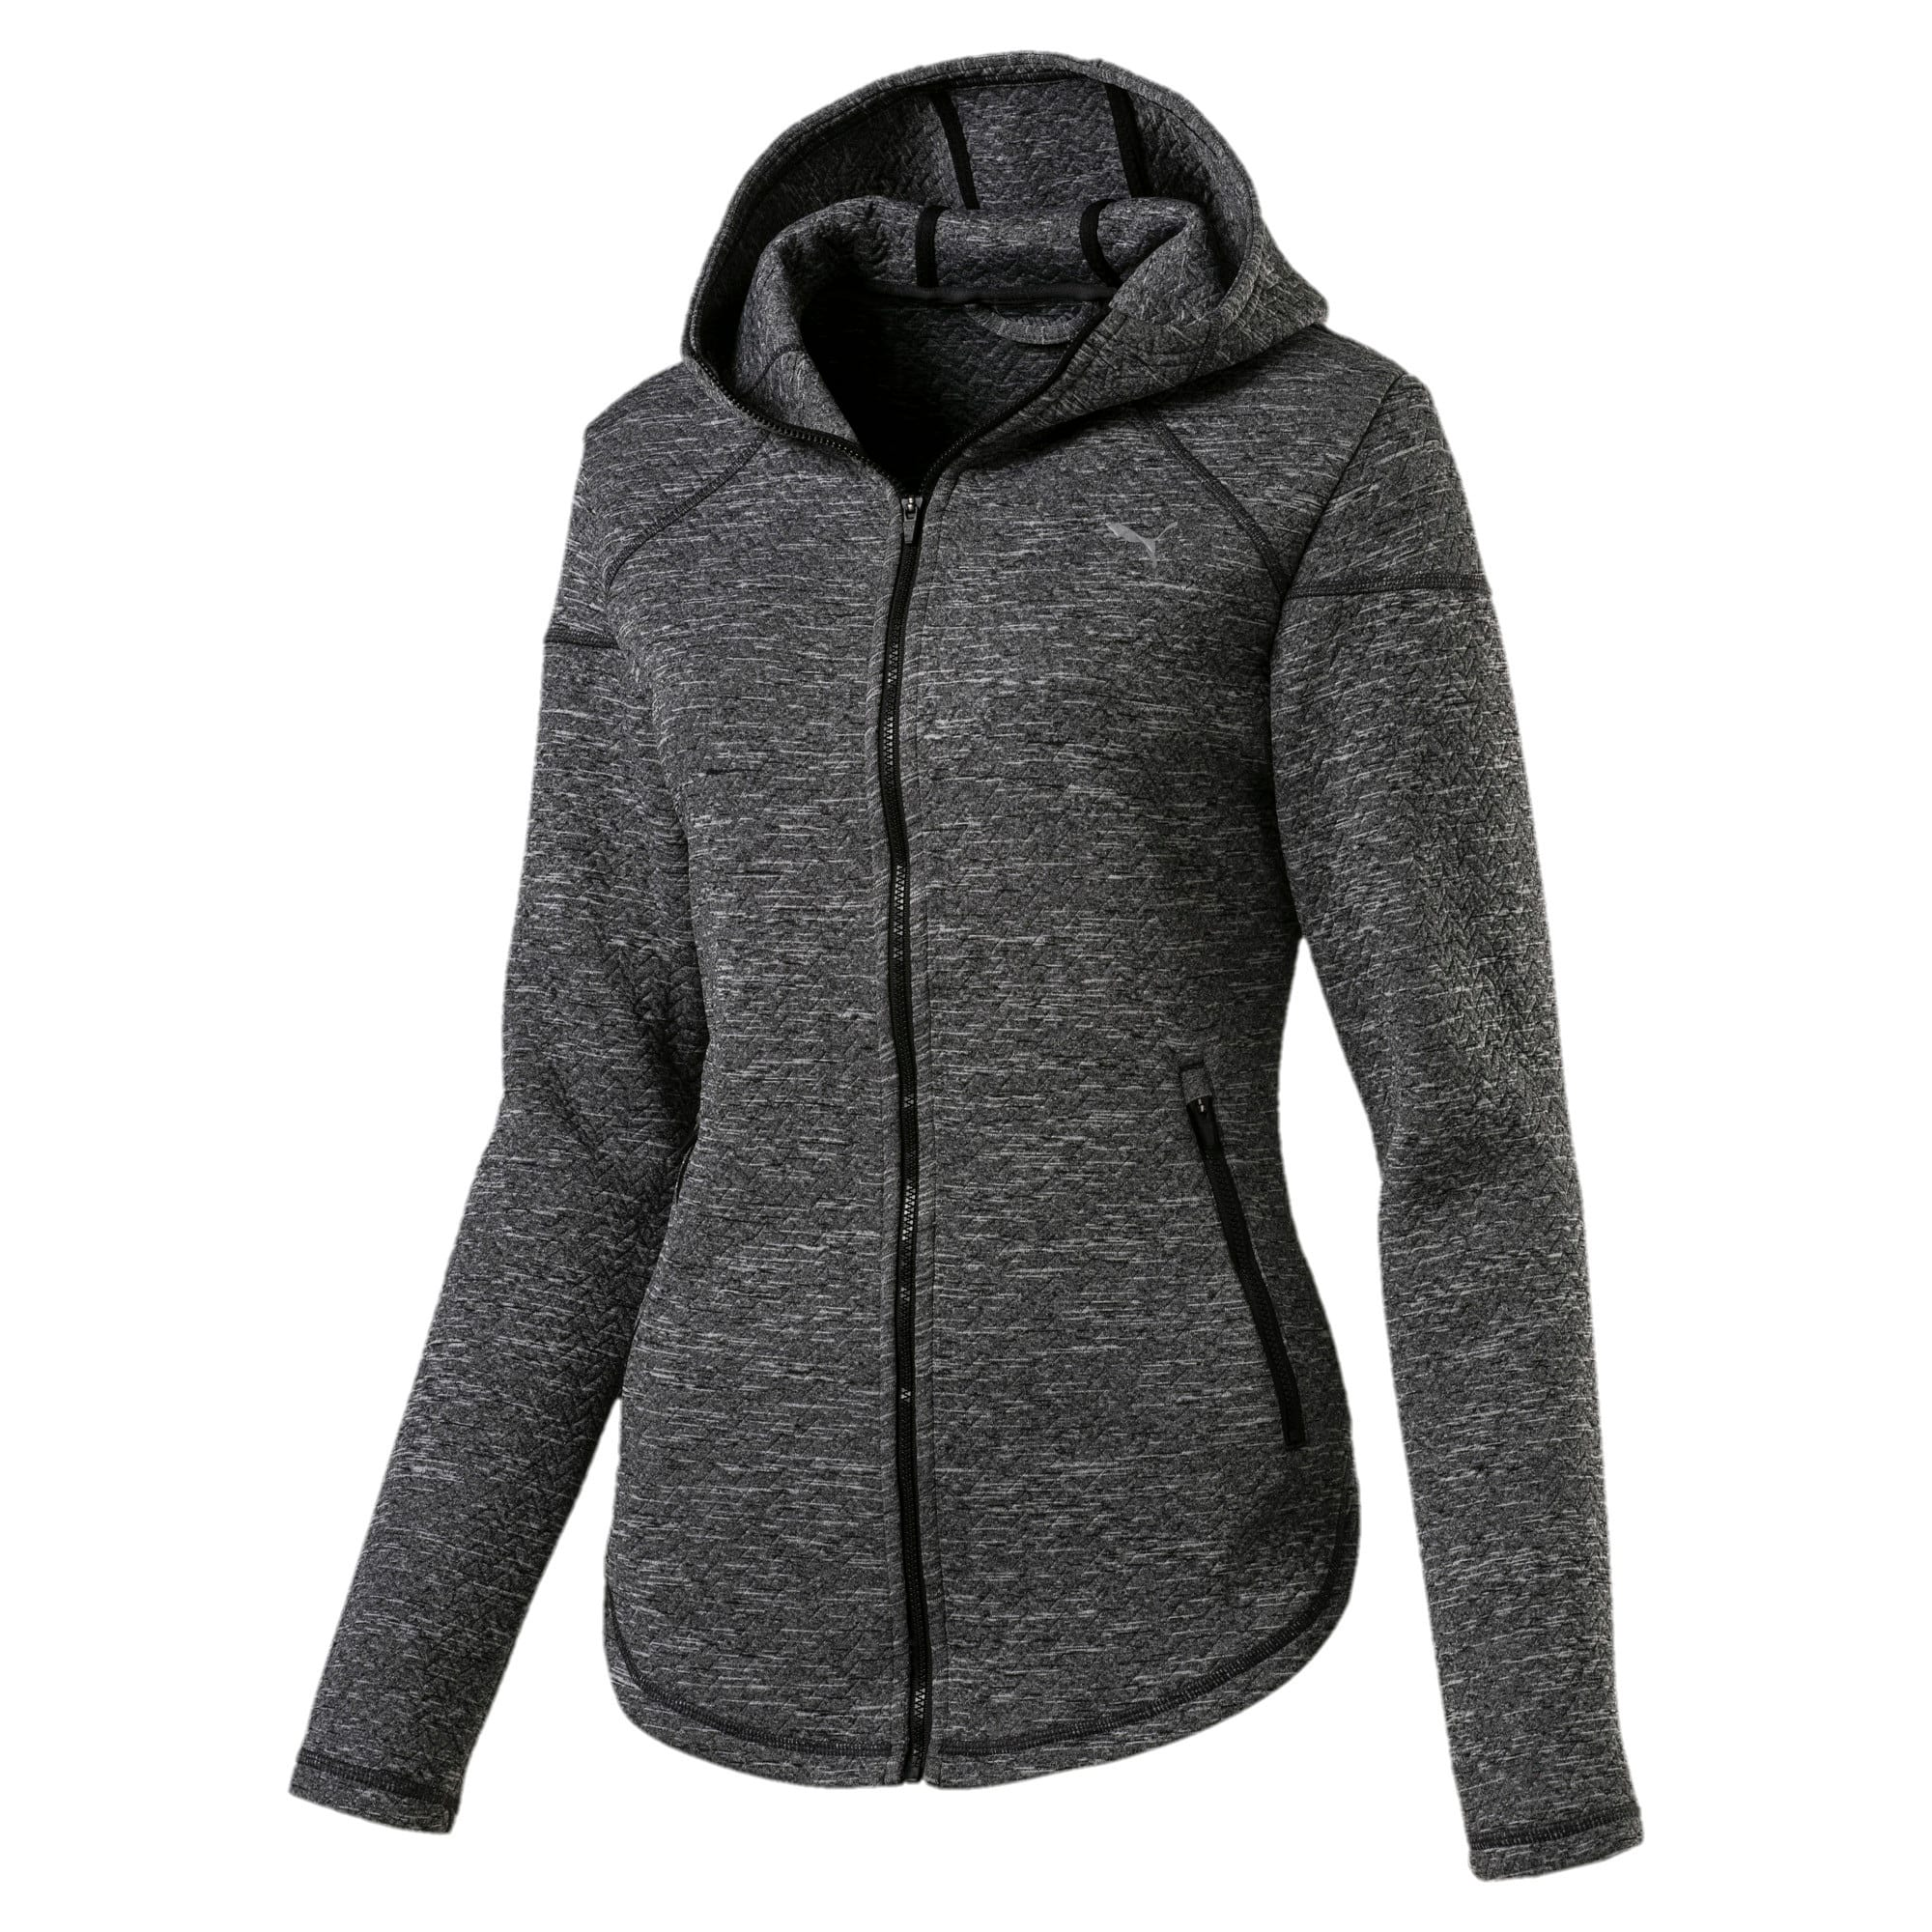 Thumbnail 4 of Active Training Women's Nocturnal Winterized Jacket, Dark Gray Heather, medium-IND